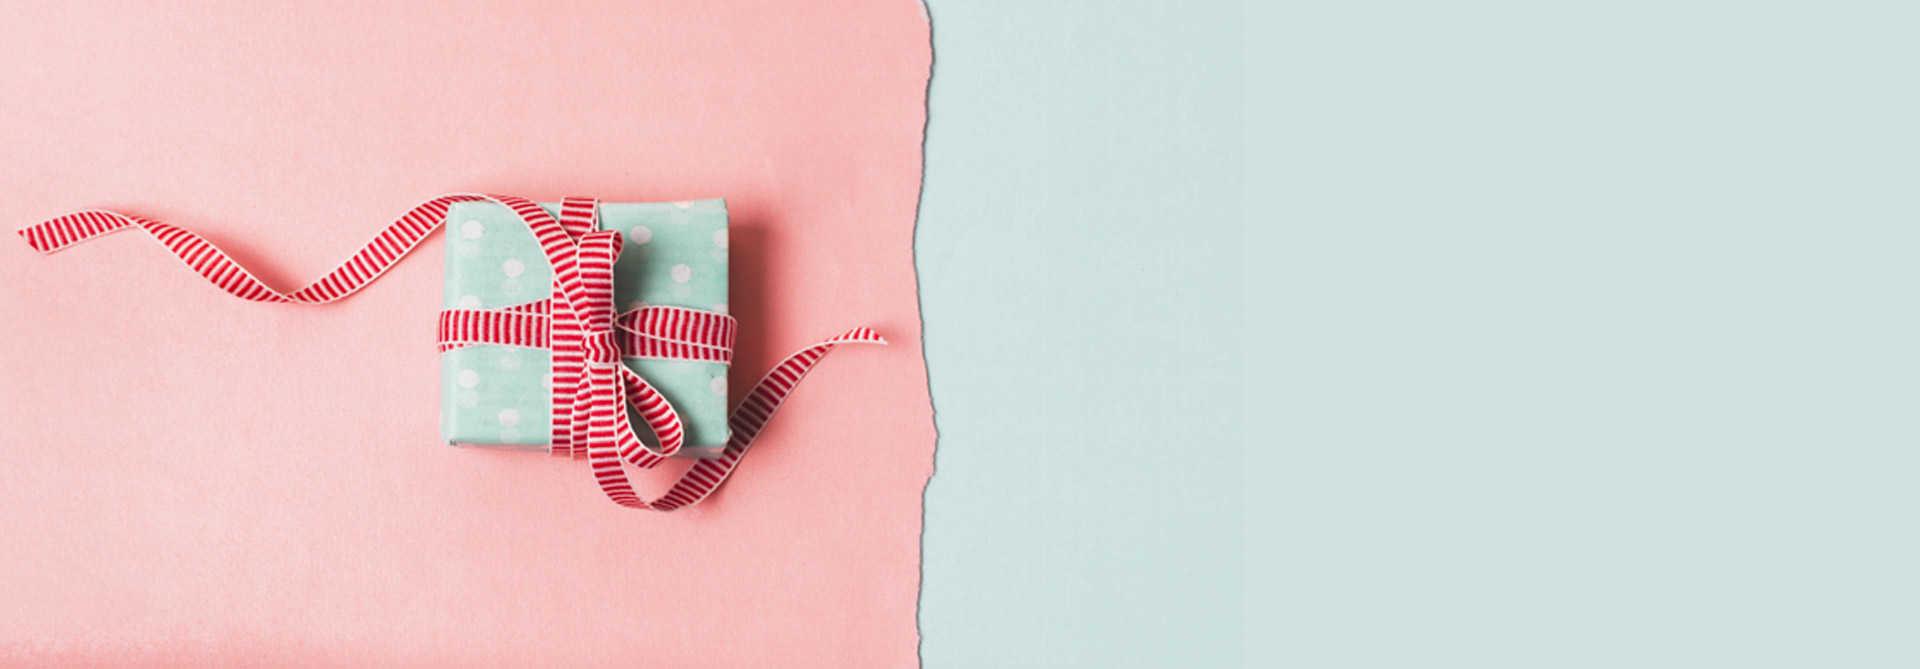 Send Gift to Boushehr | Order Gift in Boushehr | Florists inexpensively | Boushehr Florist | Boushehr Gift